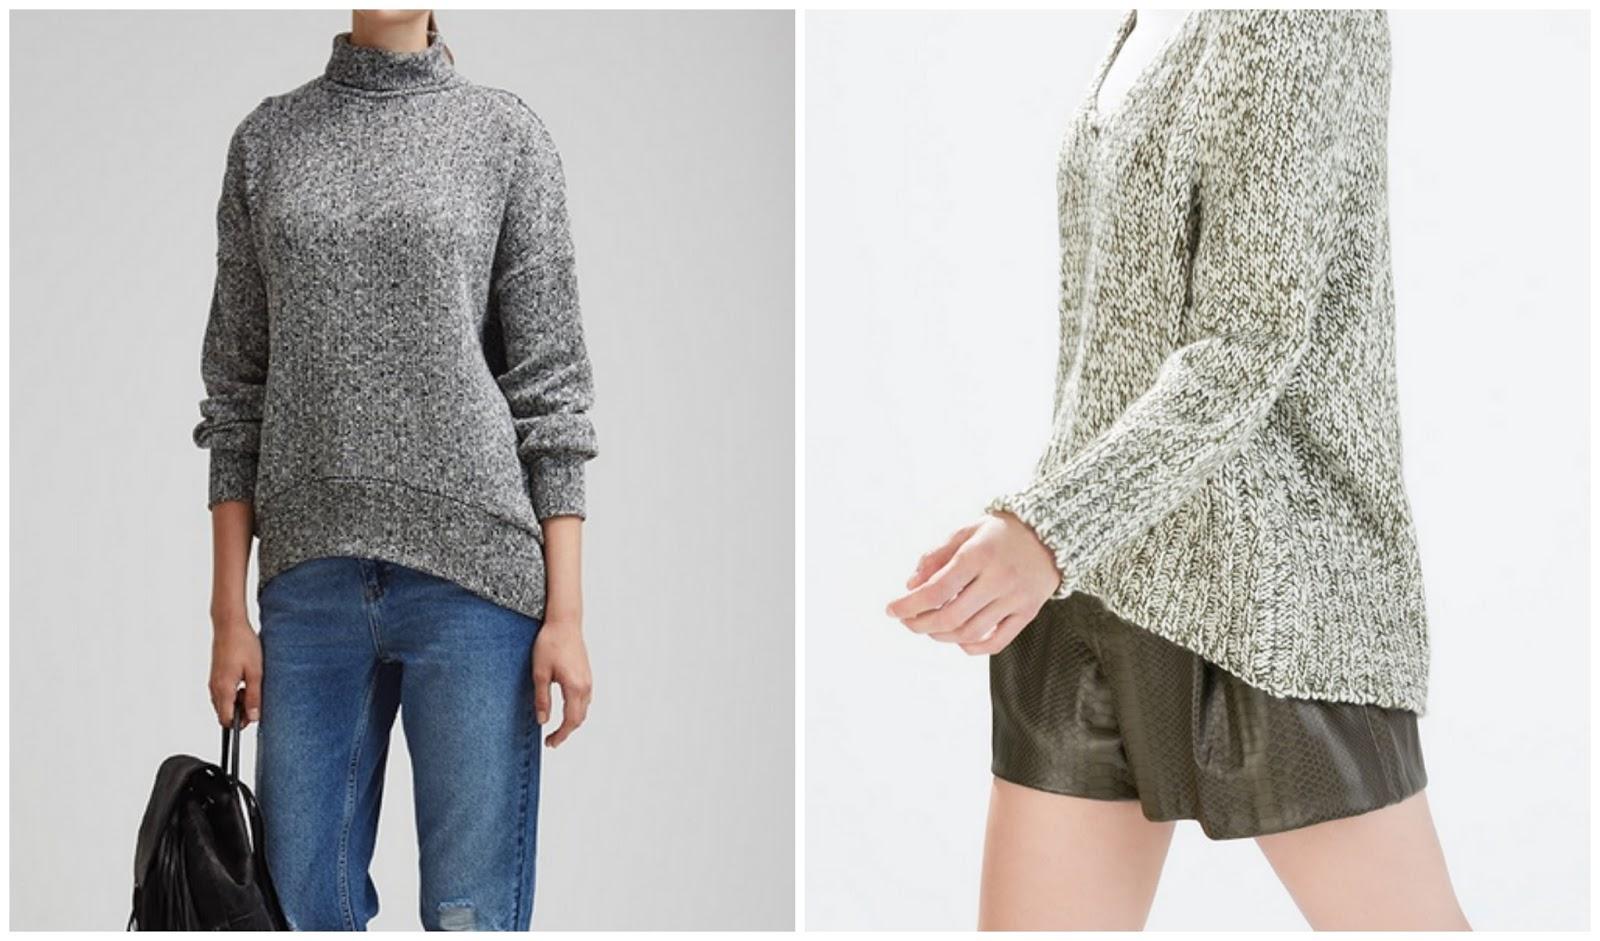 sueter Zara y H&M